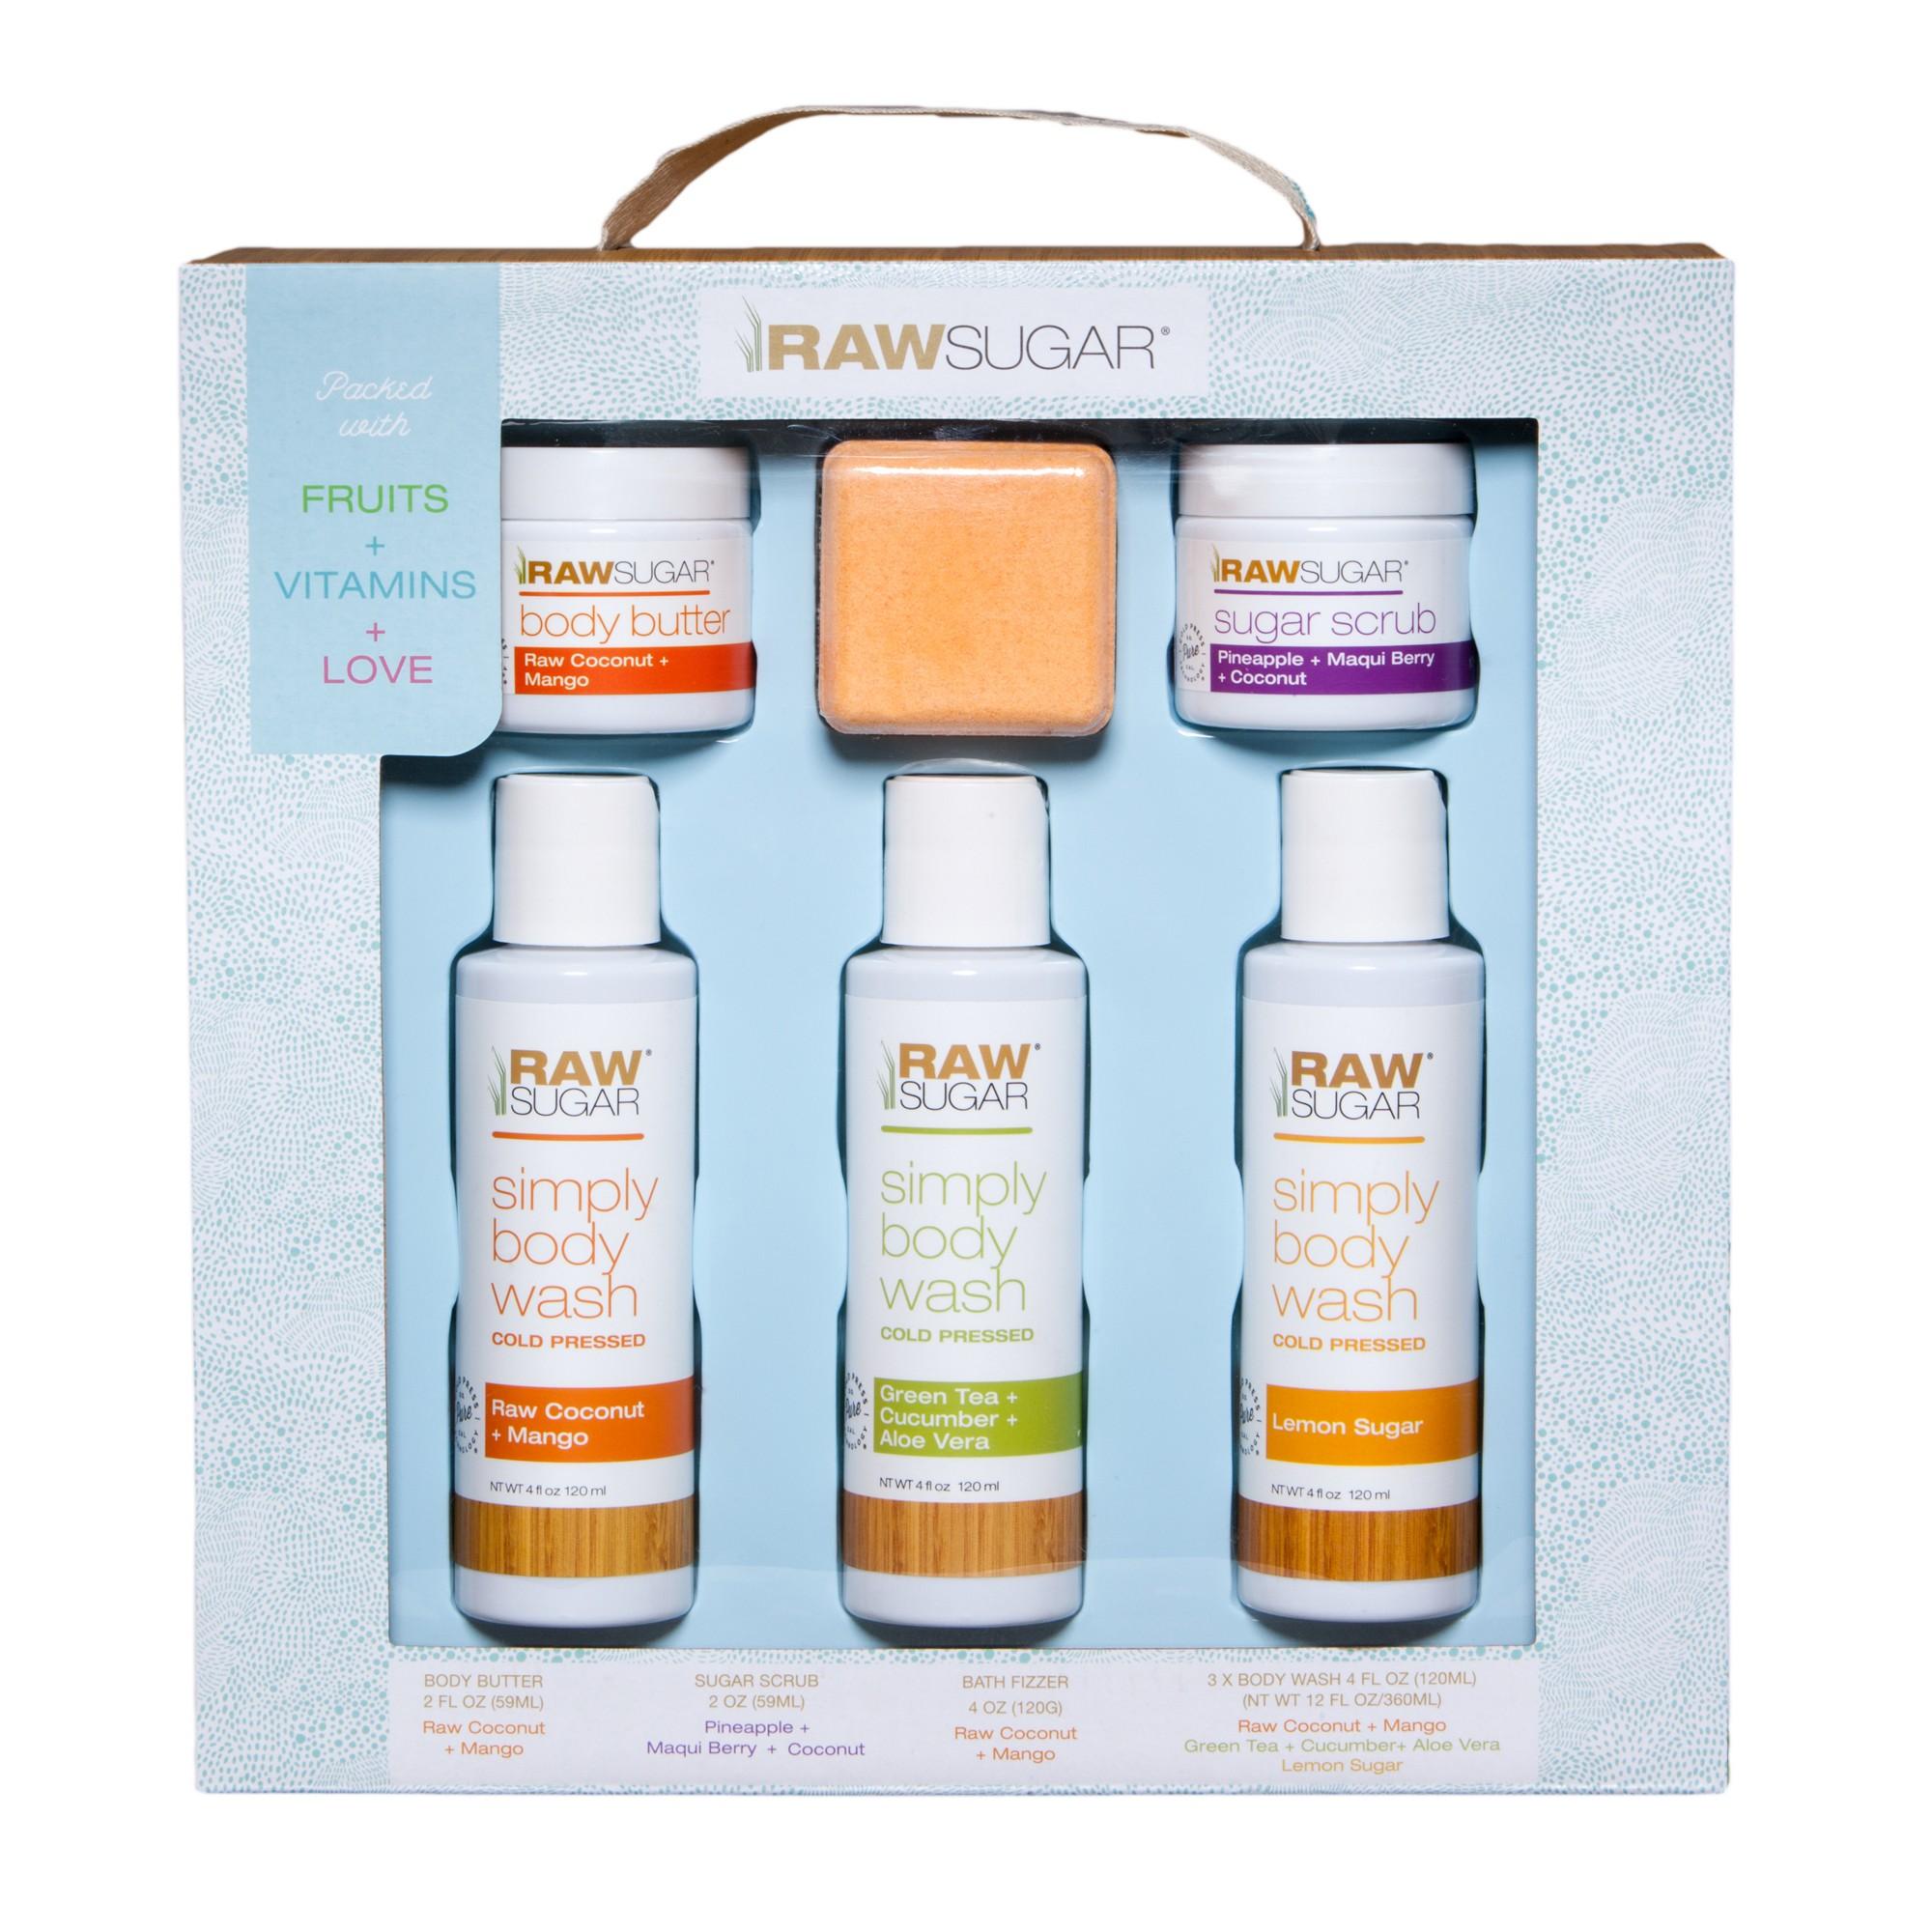 Raw Sugar Body Bath Gift Set Products Sugar Spa Day At Home Soap